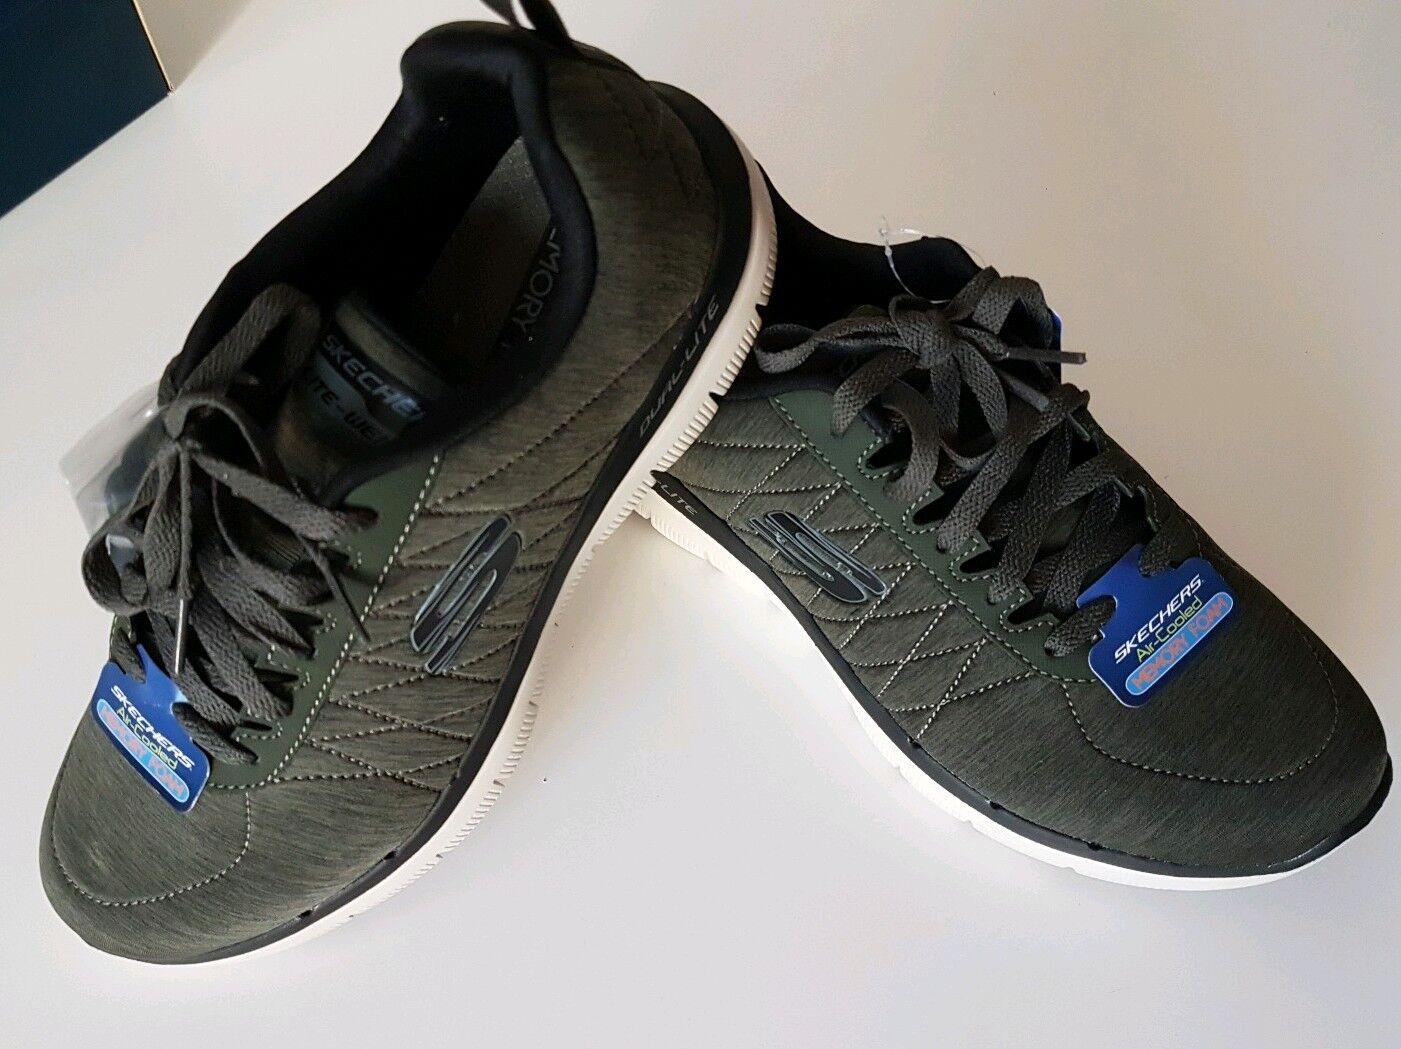 Sketchers *NEU** Flex Advantage 2.0 Chillston Sneakers Grösse 41 *NEU** Sketchers af12a5